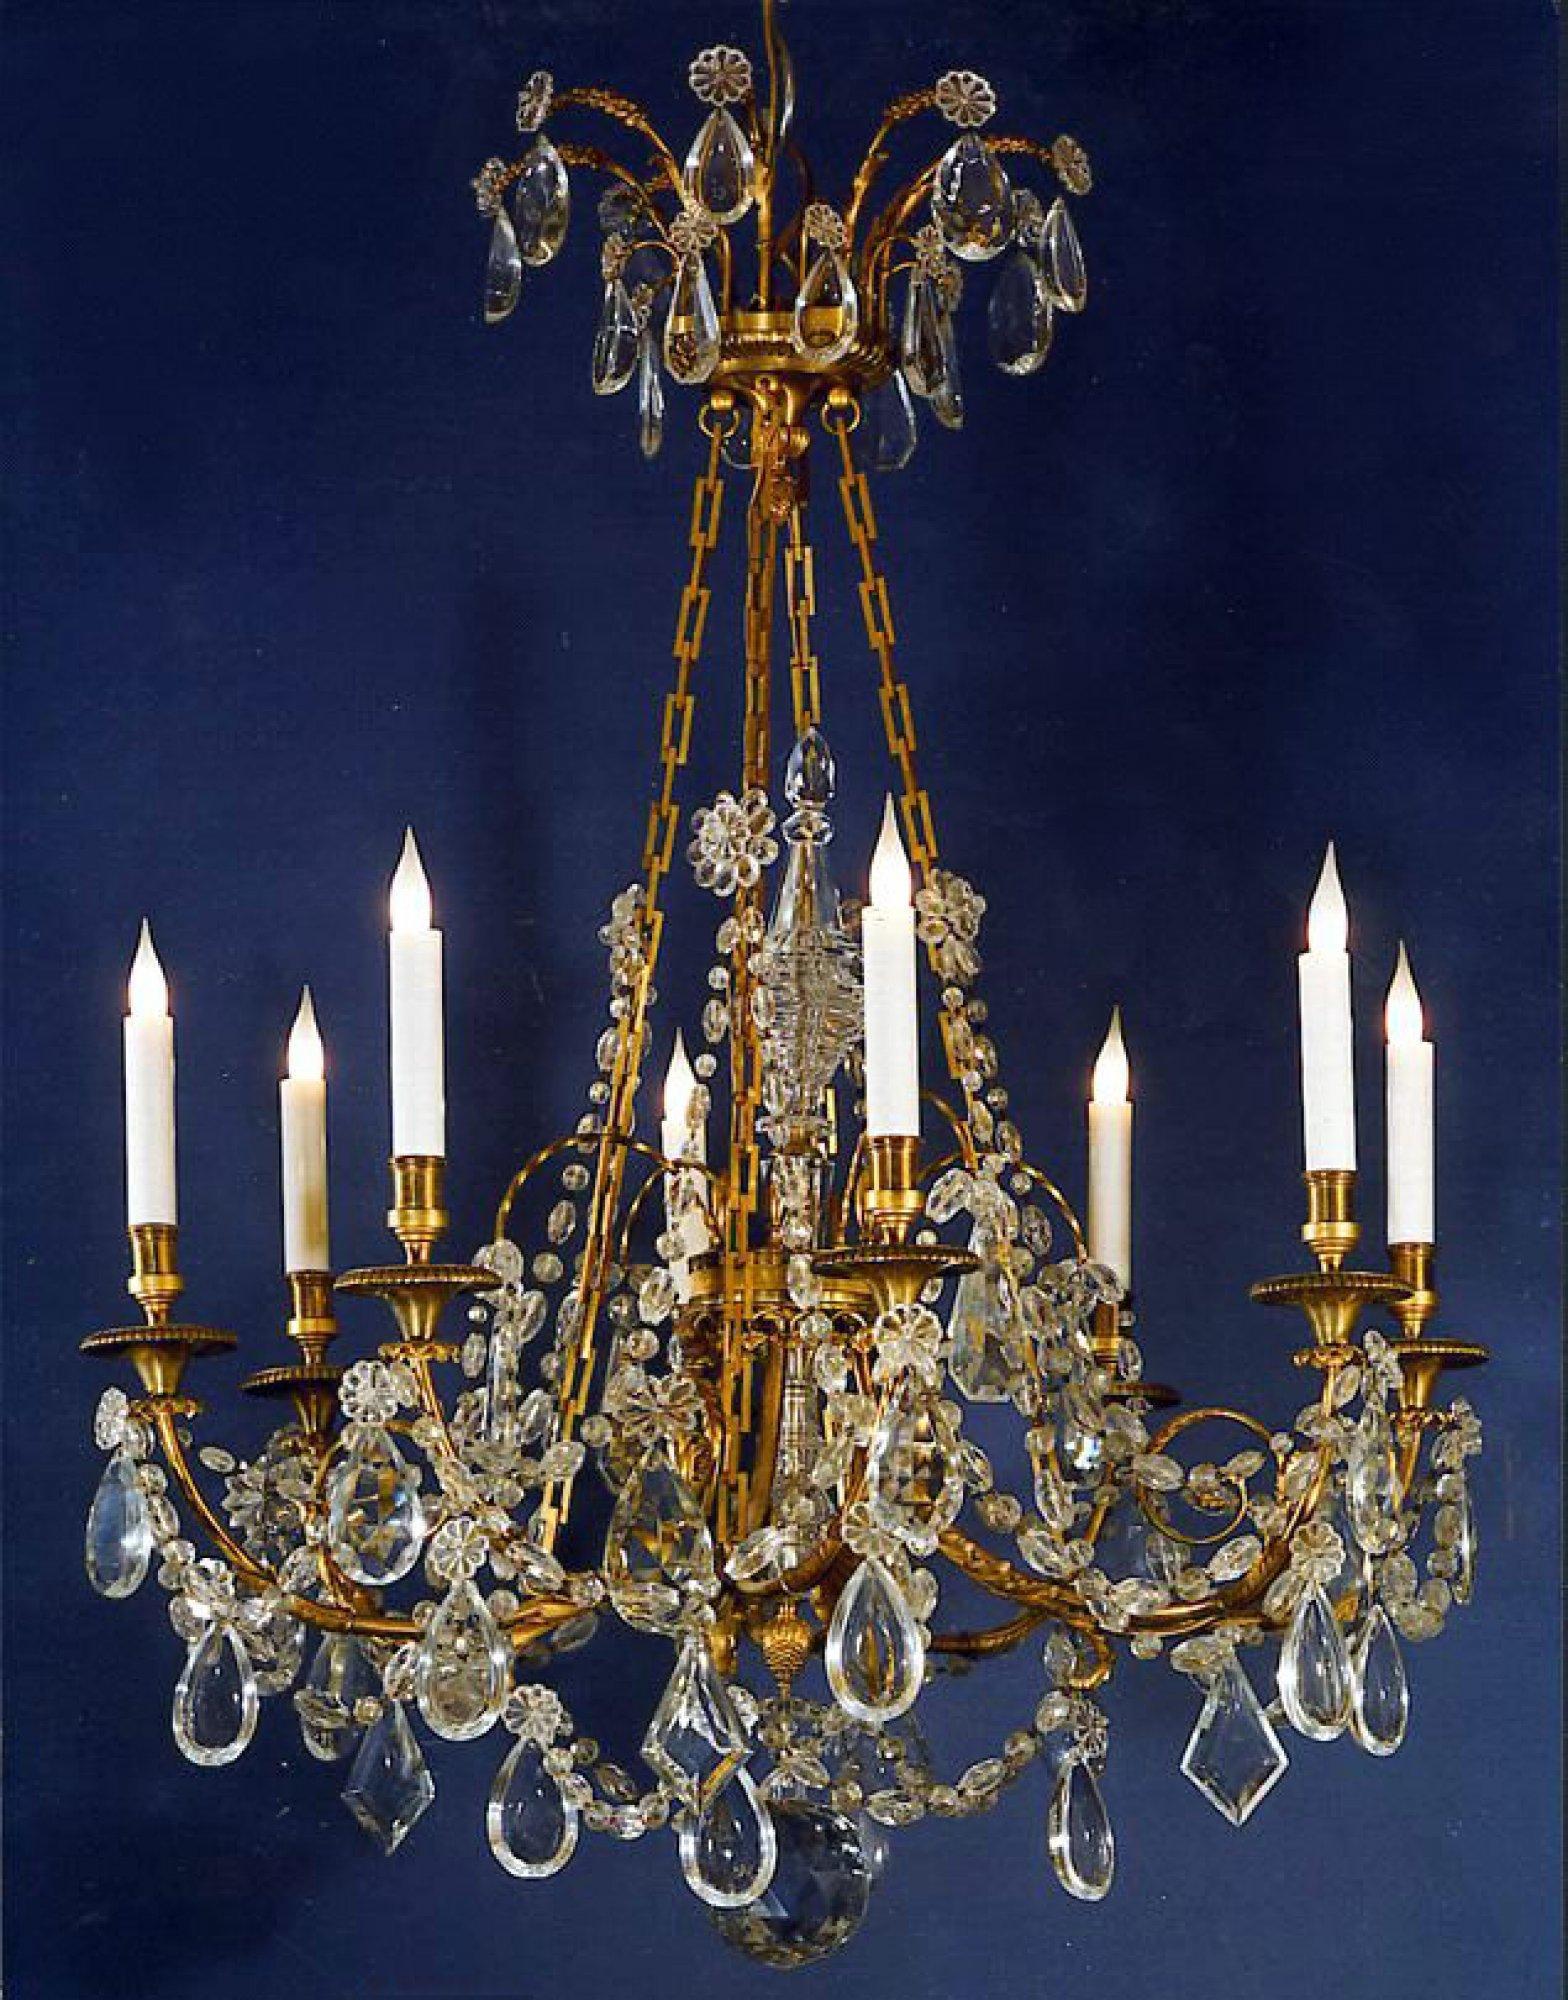 Louis XVI chandelier